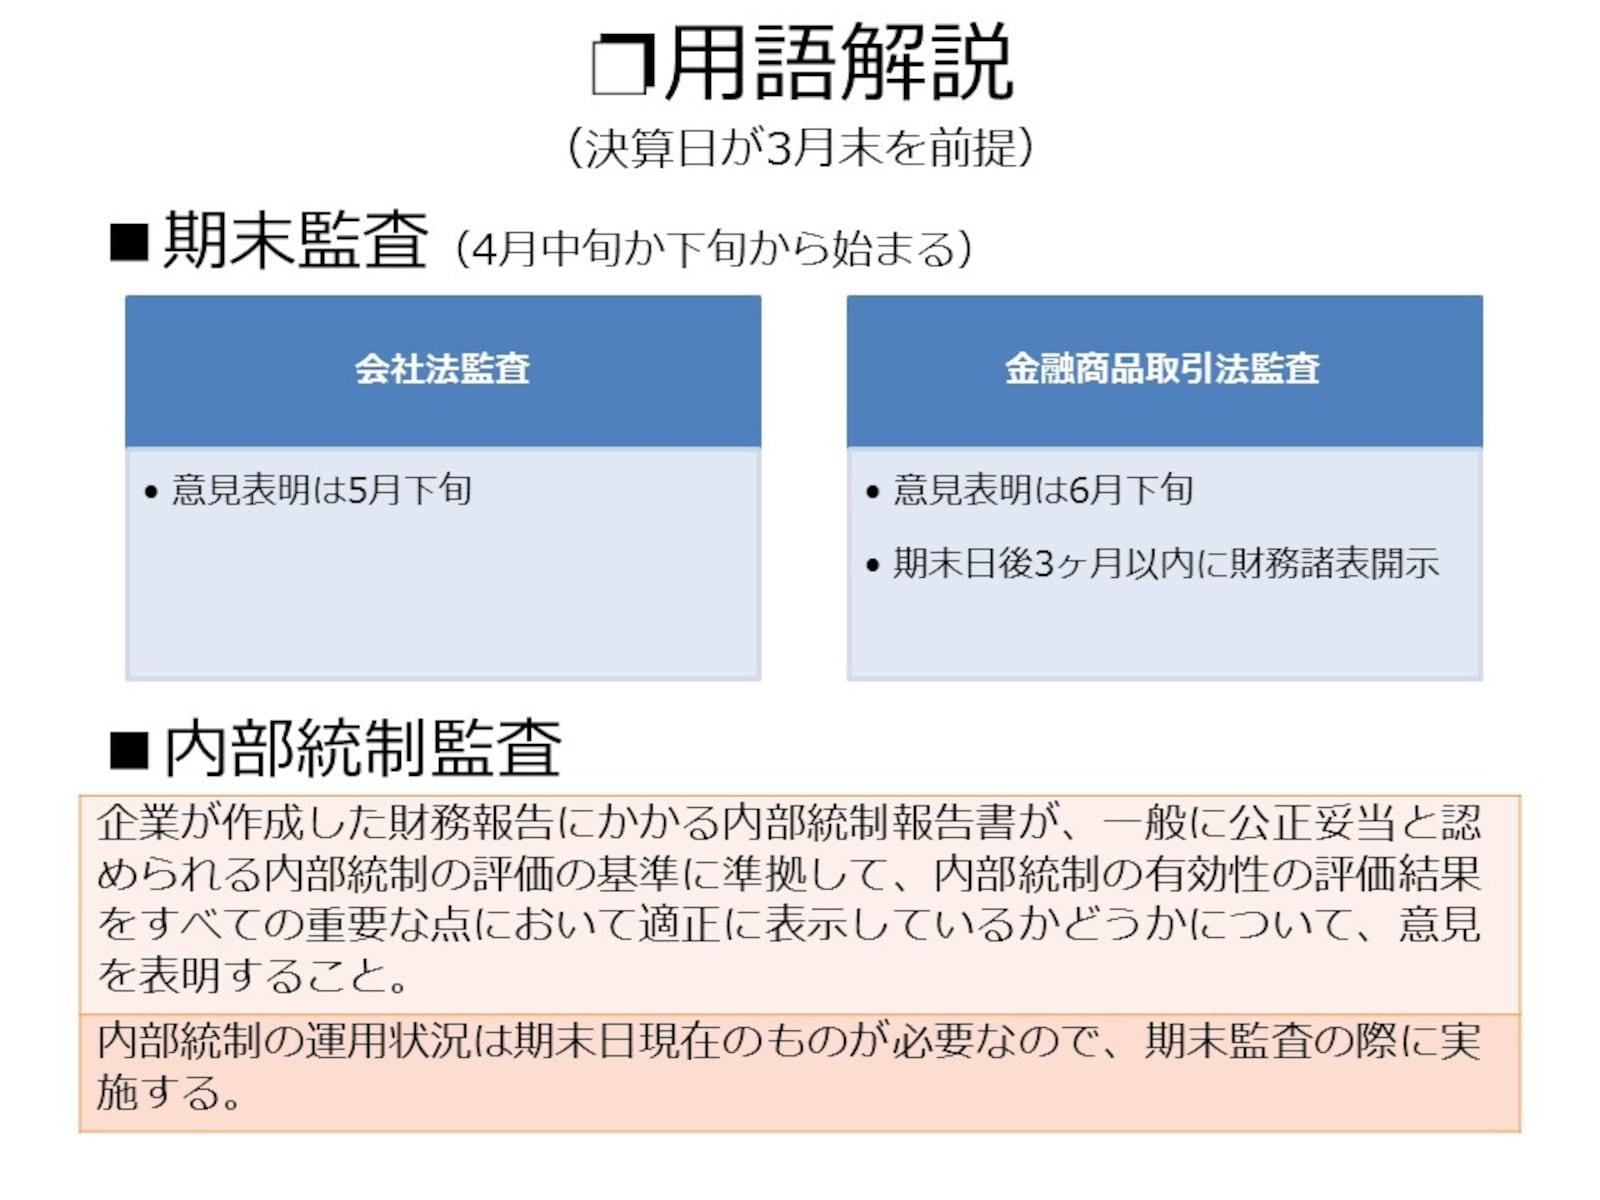 topimg_original.jpg : 漢字 勉強 サイト : 漢字